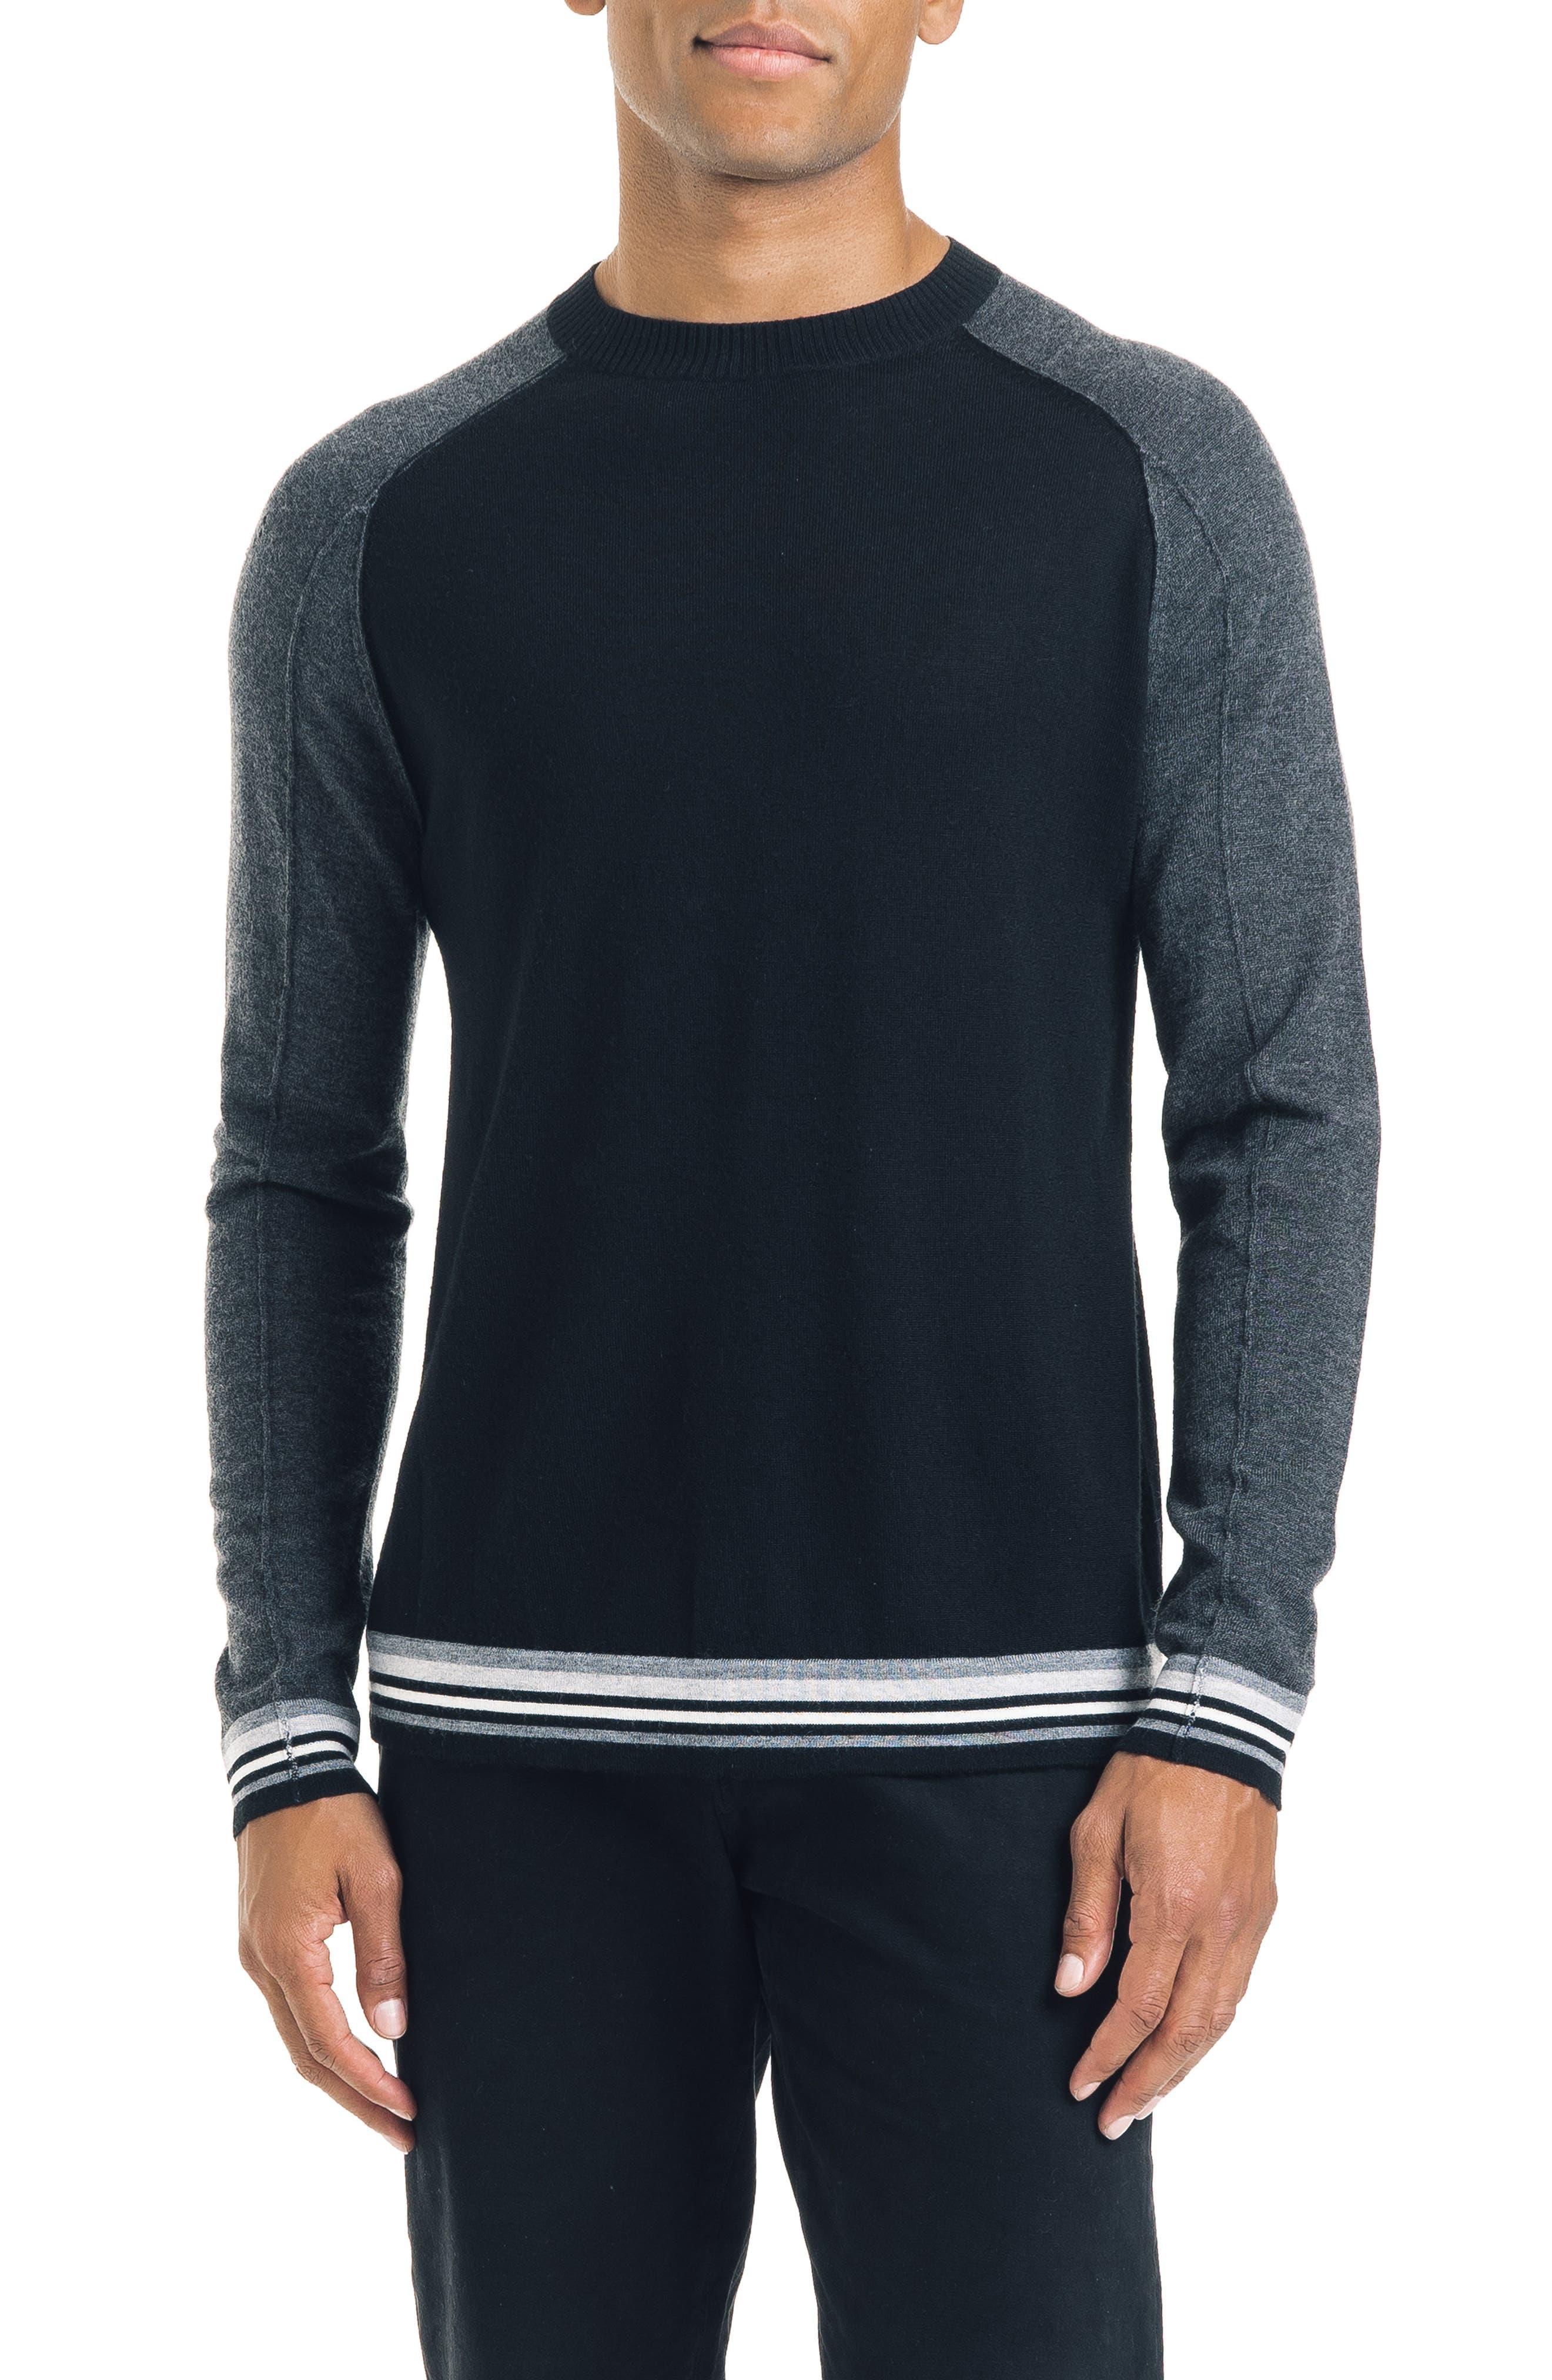 Mix Modern Slim Fit Wool Sweater,                             Main thumbnail 1, color,                             BLACK